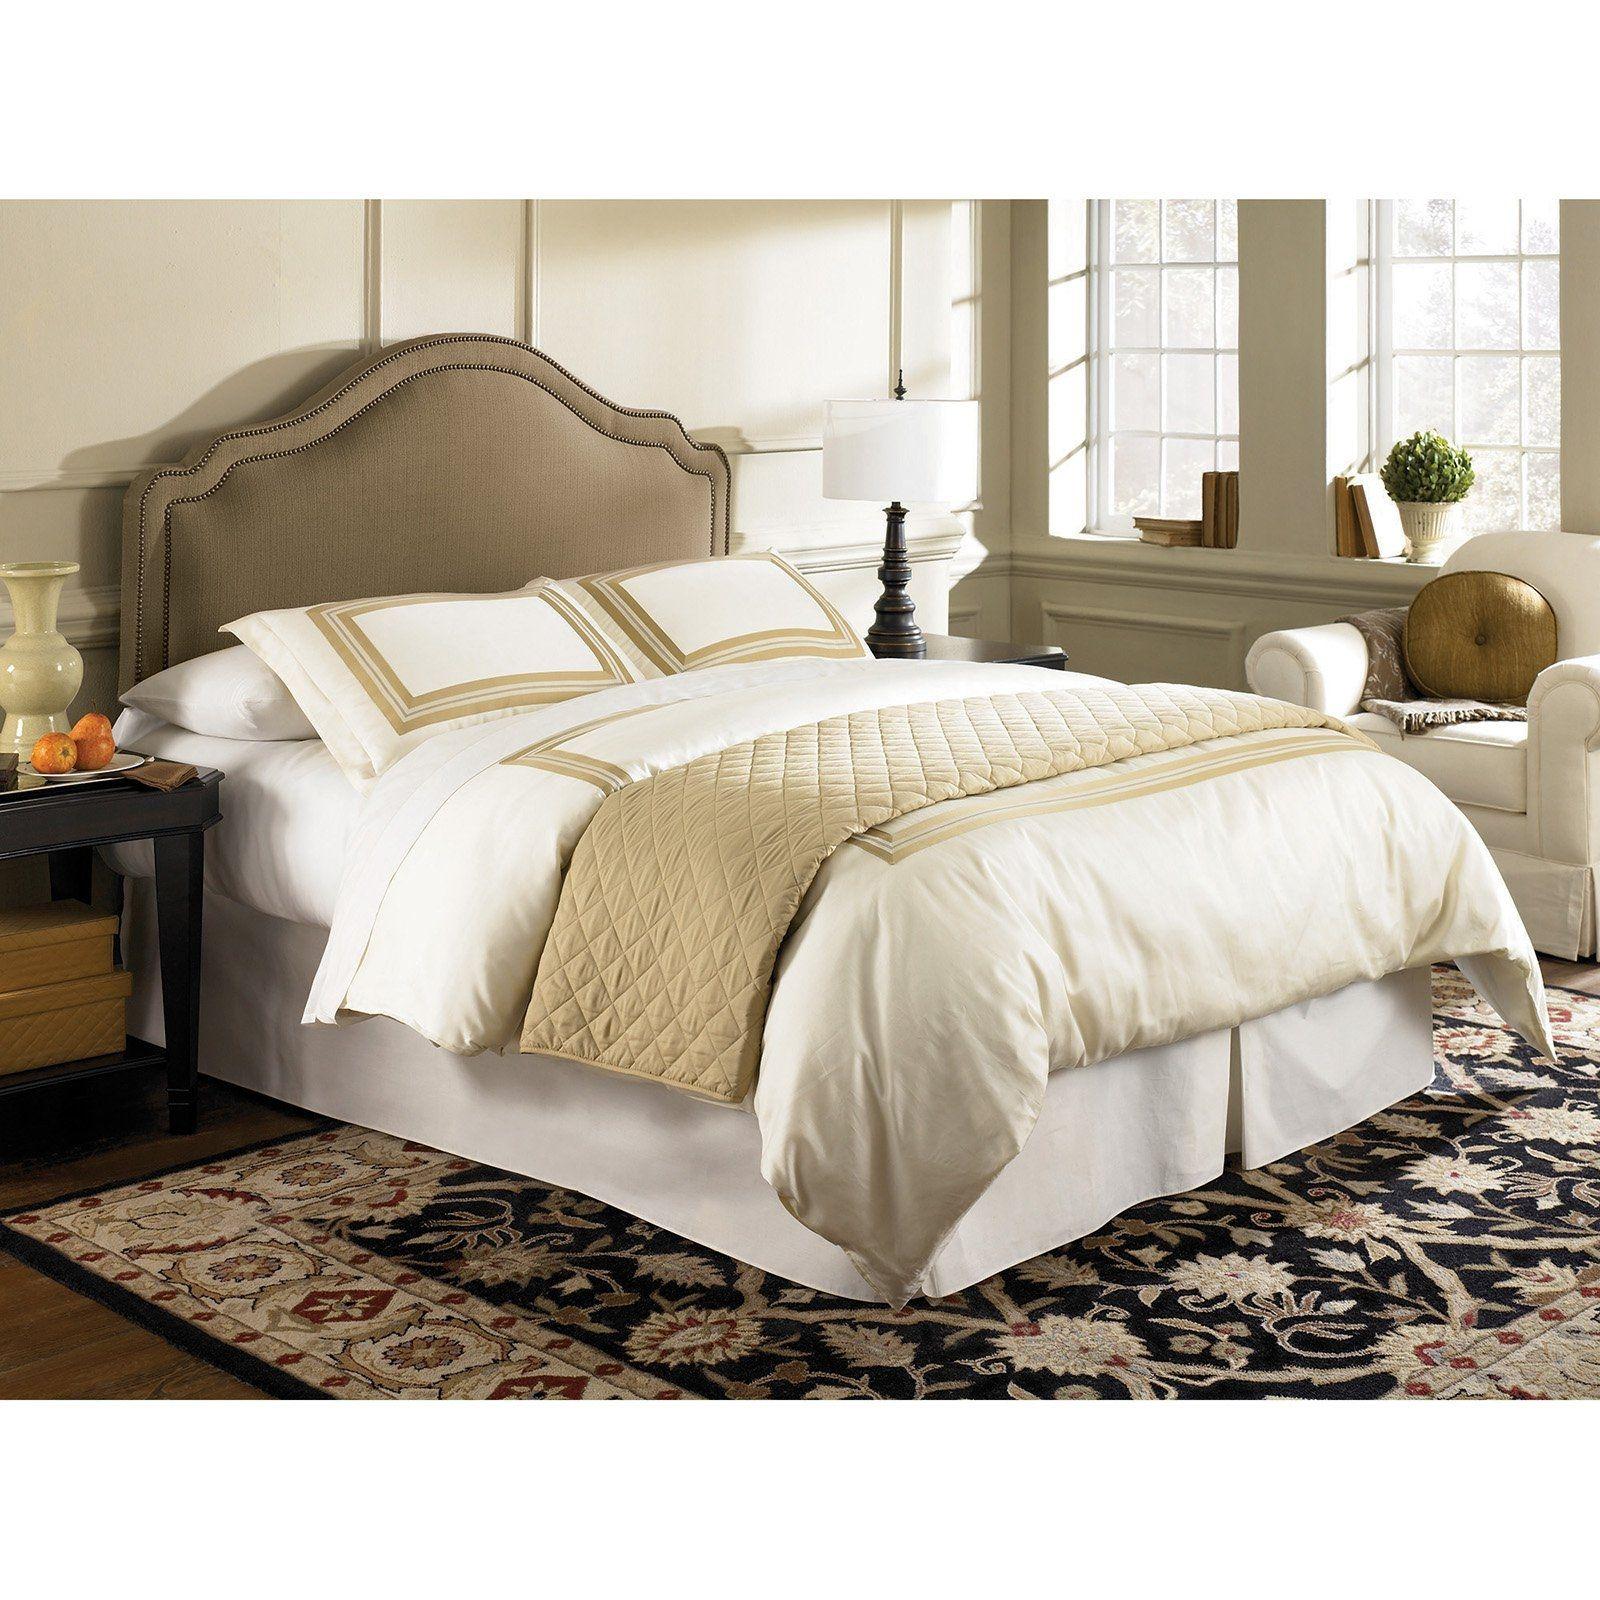 Upholstered Headboard Bed Set Upholstered Headboard Bed